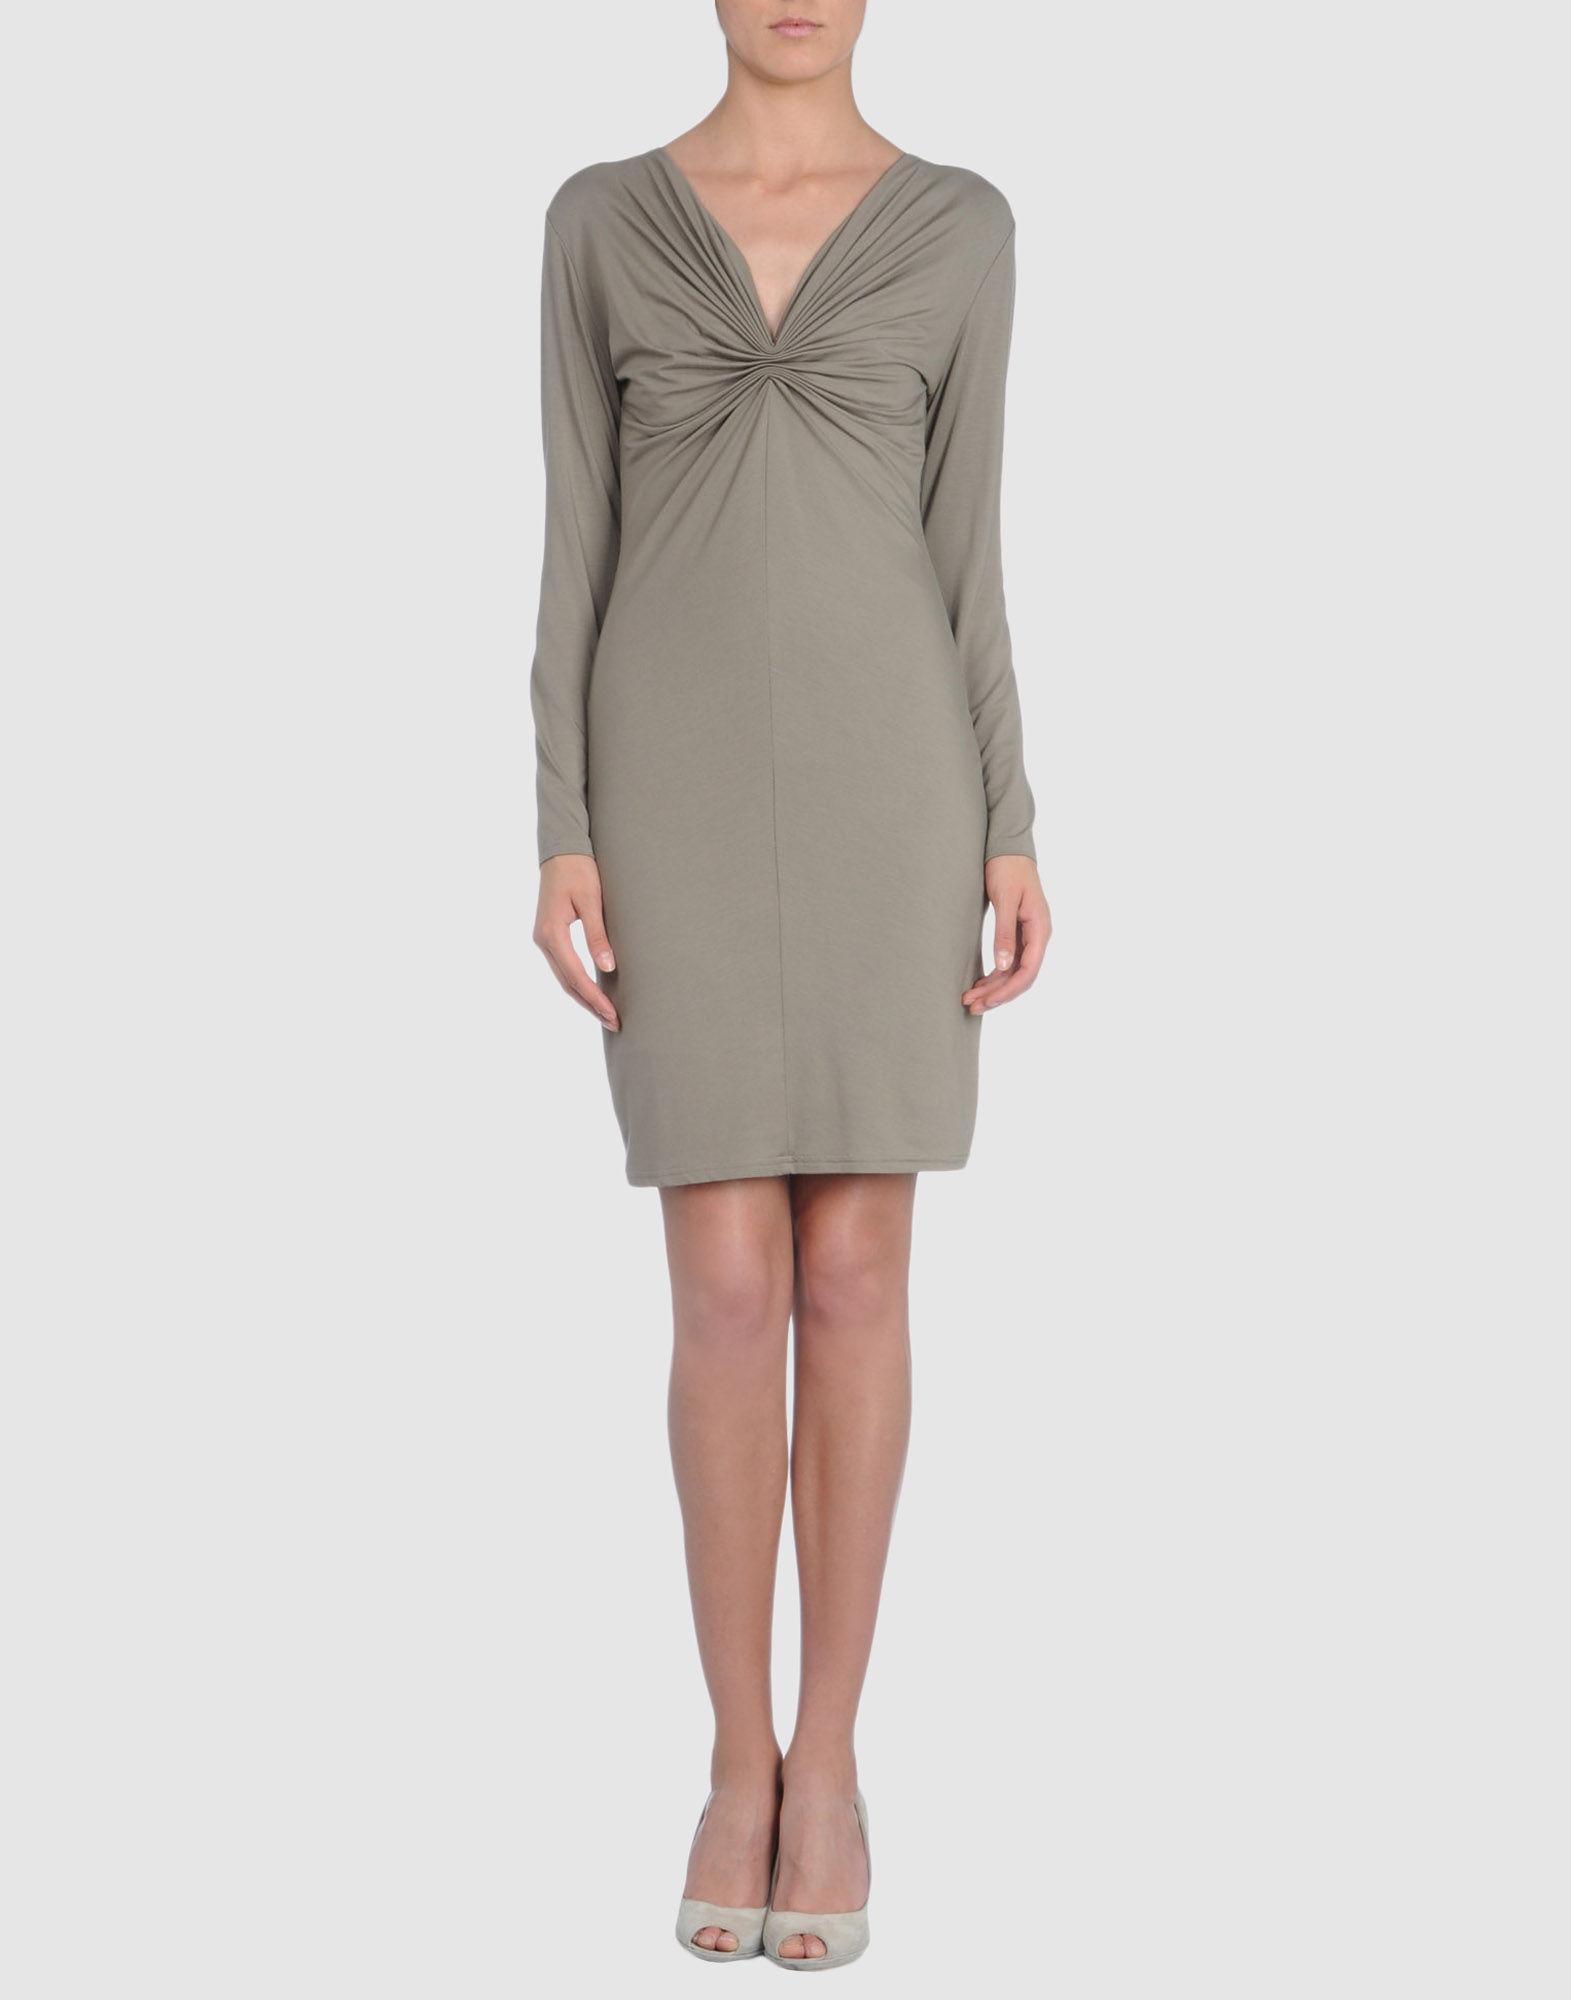 34208052XJ 14 f - Evening Φορεματα Victoria Coleman Κωδ.06